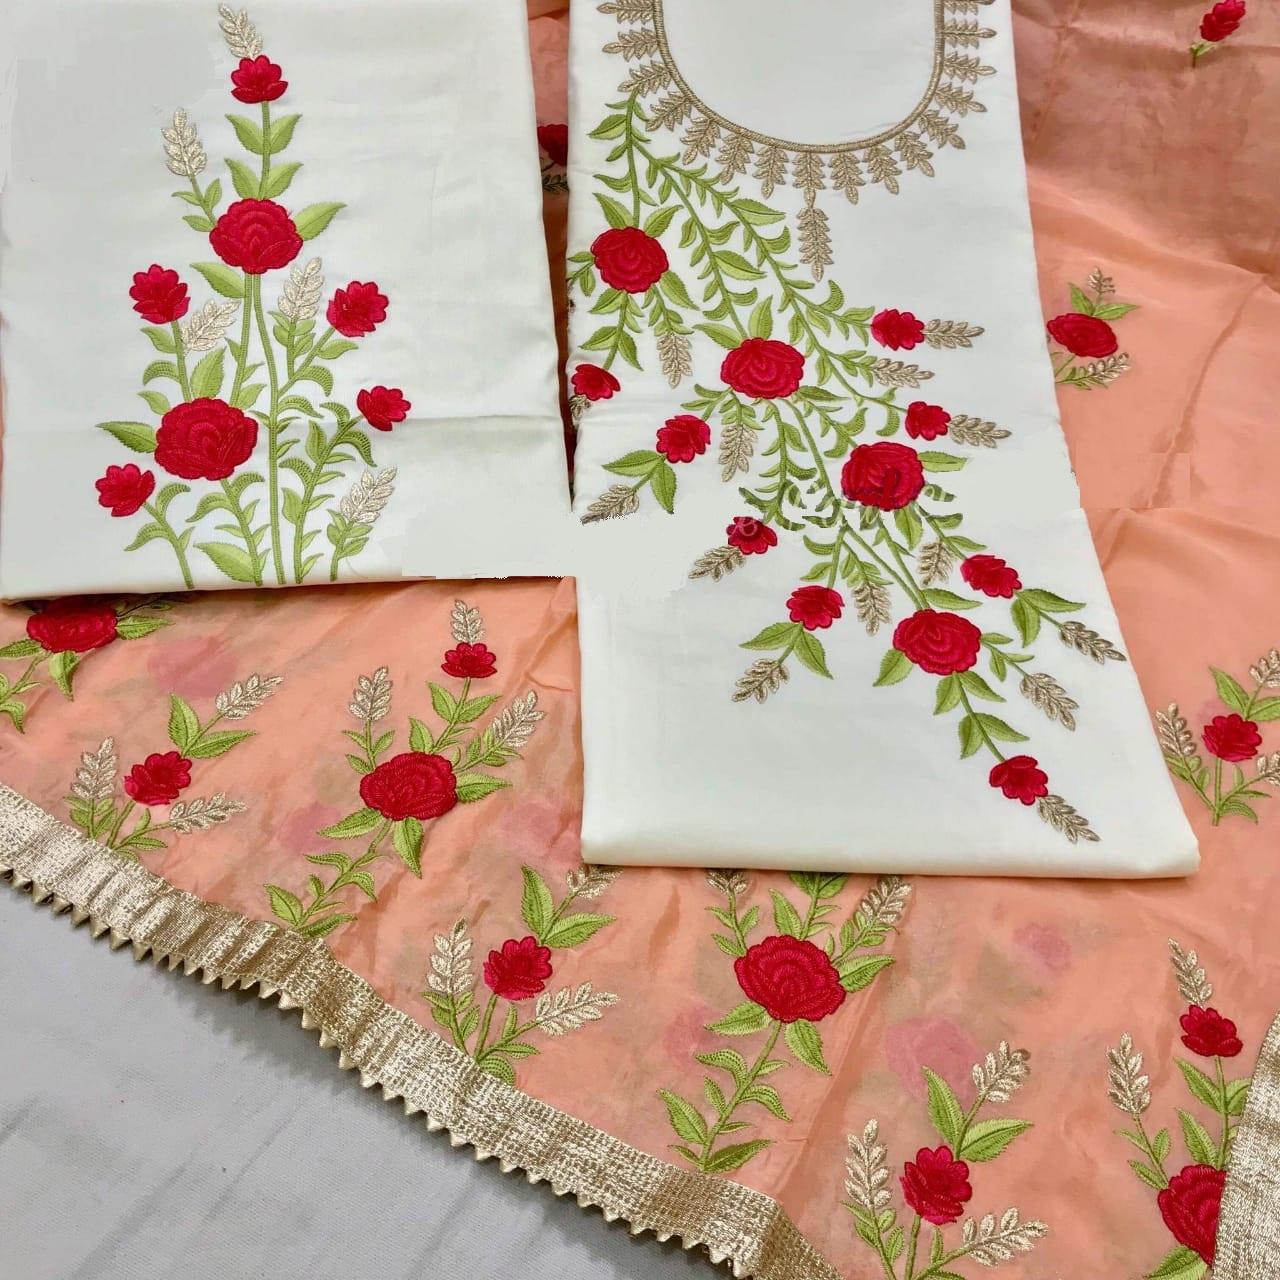 Buy White Cotton Salwar Suit With Orange Dupatta Online in India - YOYO Fashion